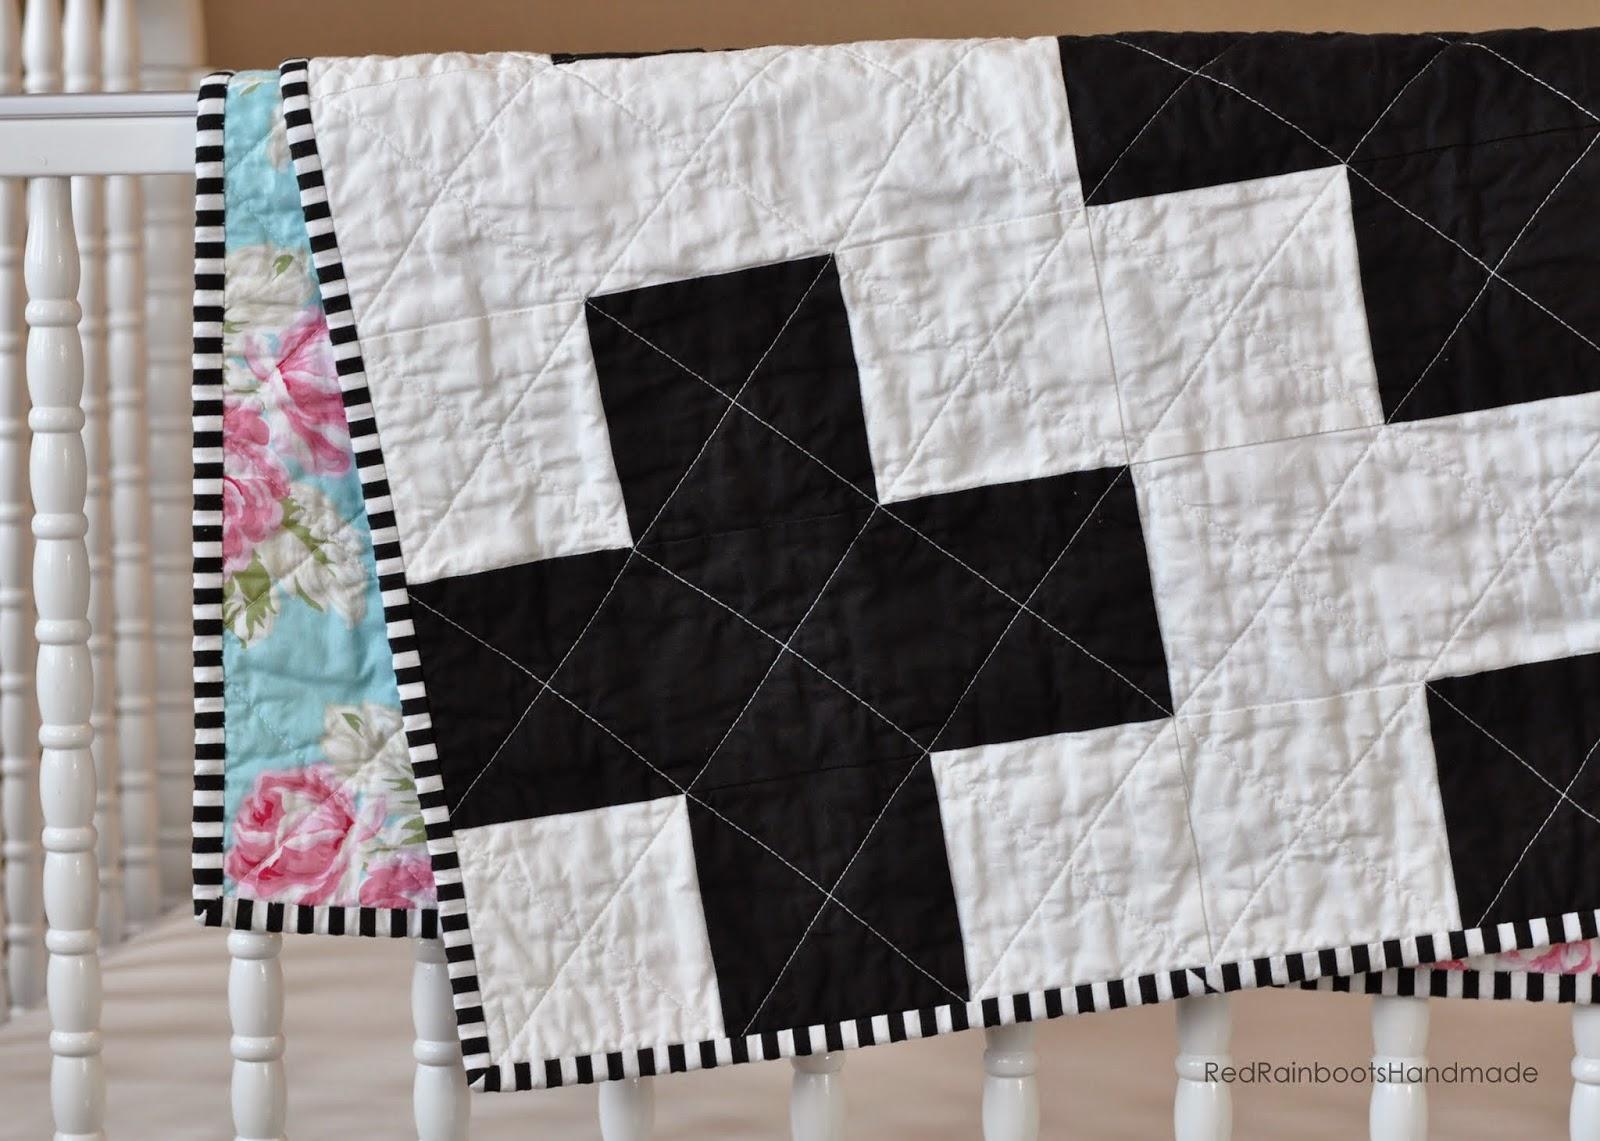 http://redrainbootshandmade.blogspot.com/2015/01/baby-quilts.html